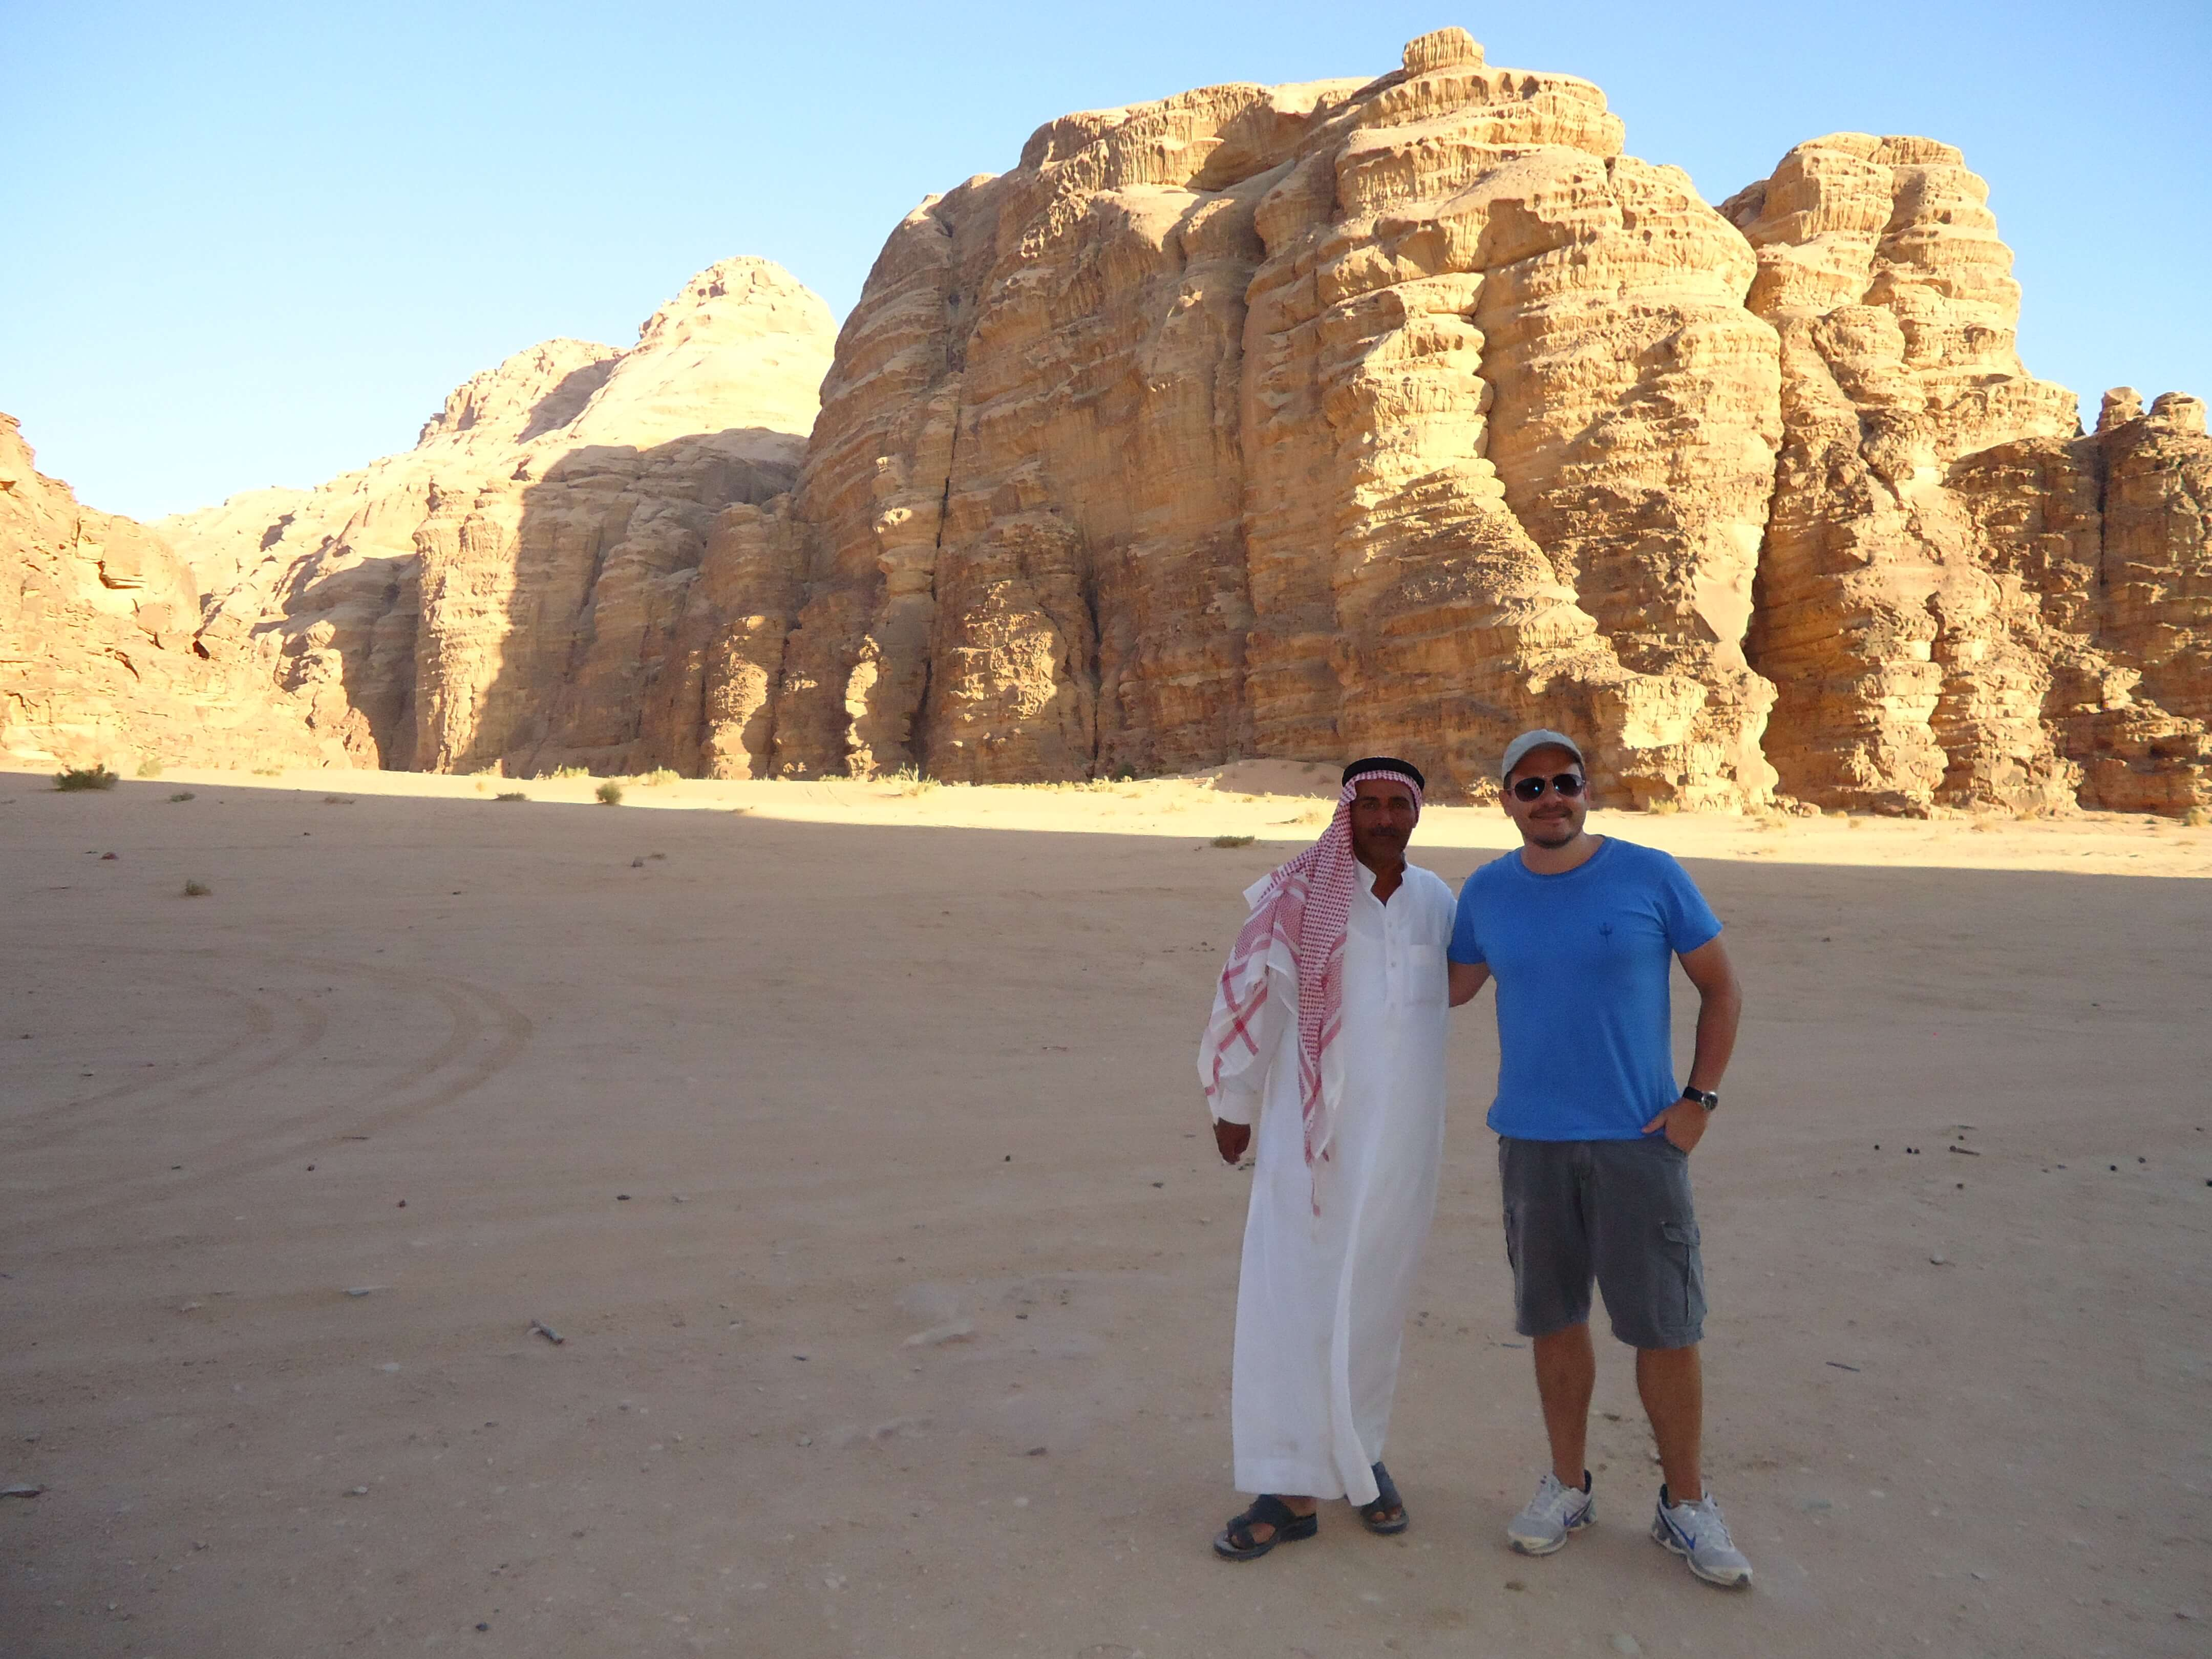 Relatos de viagem: Wadi Rum